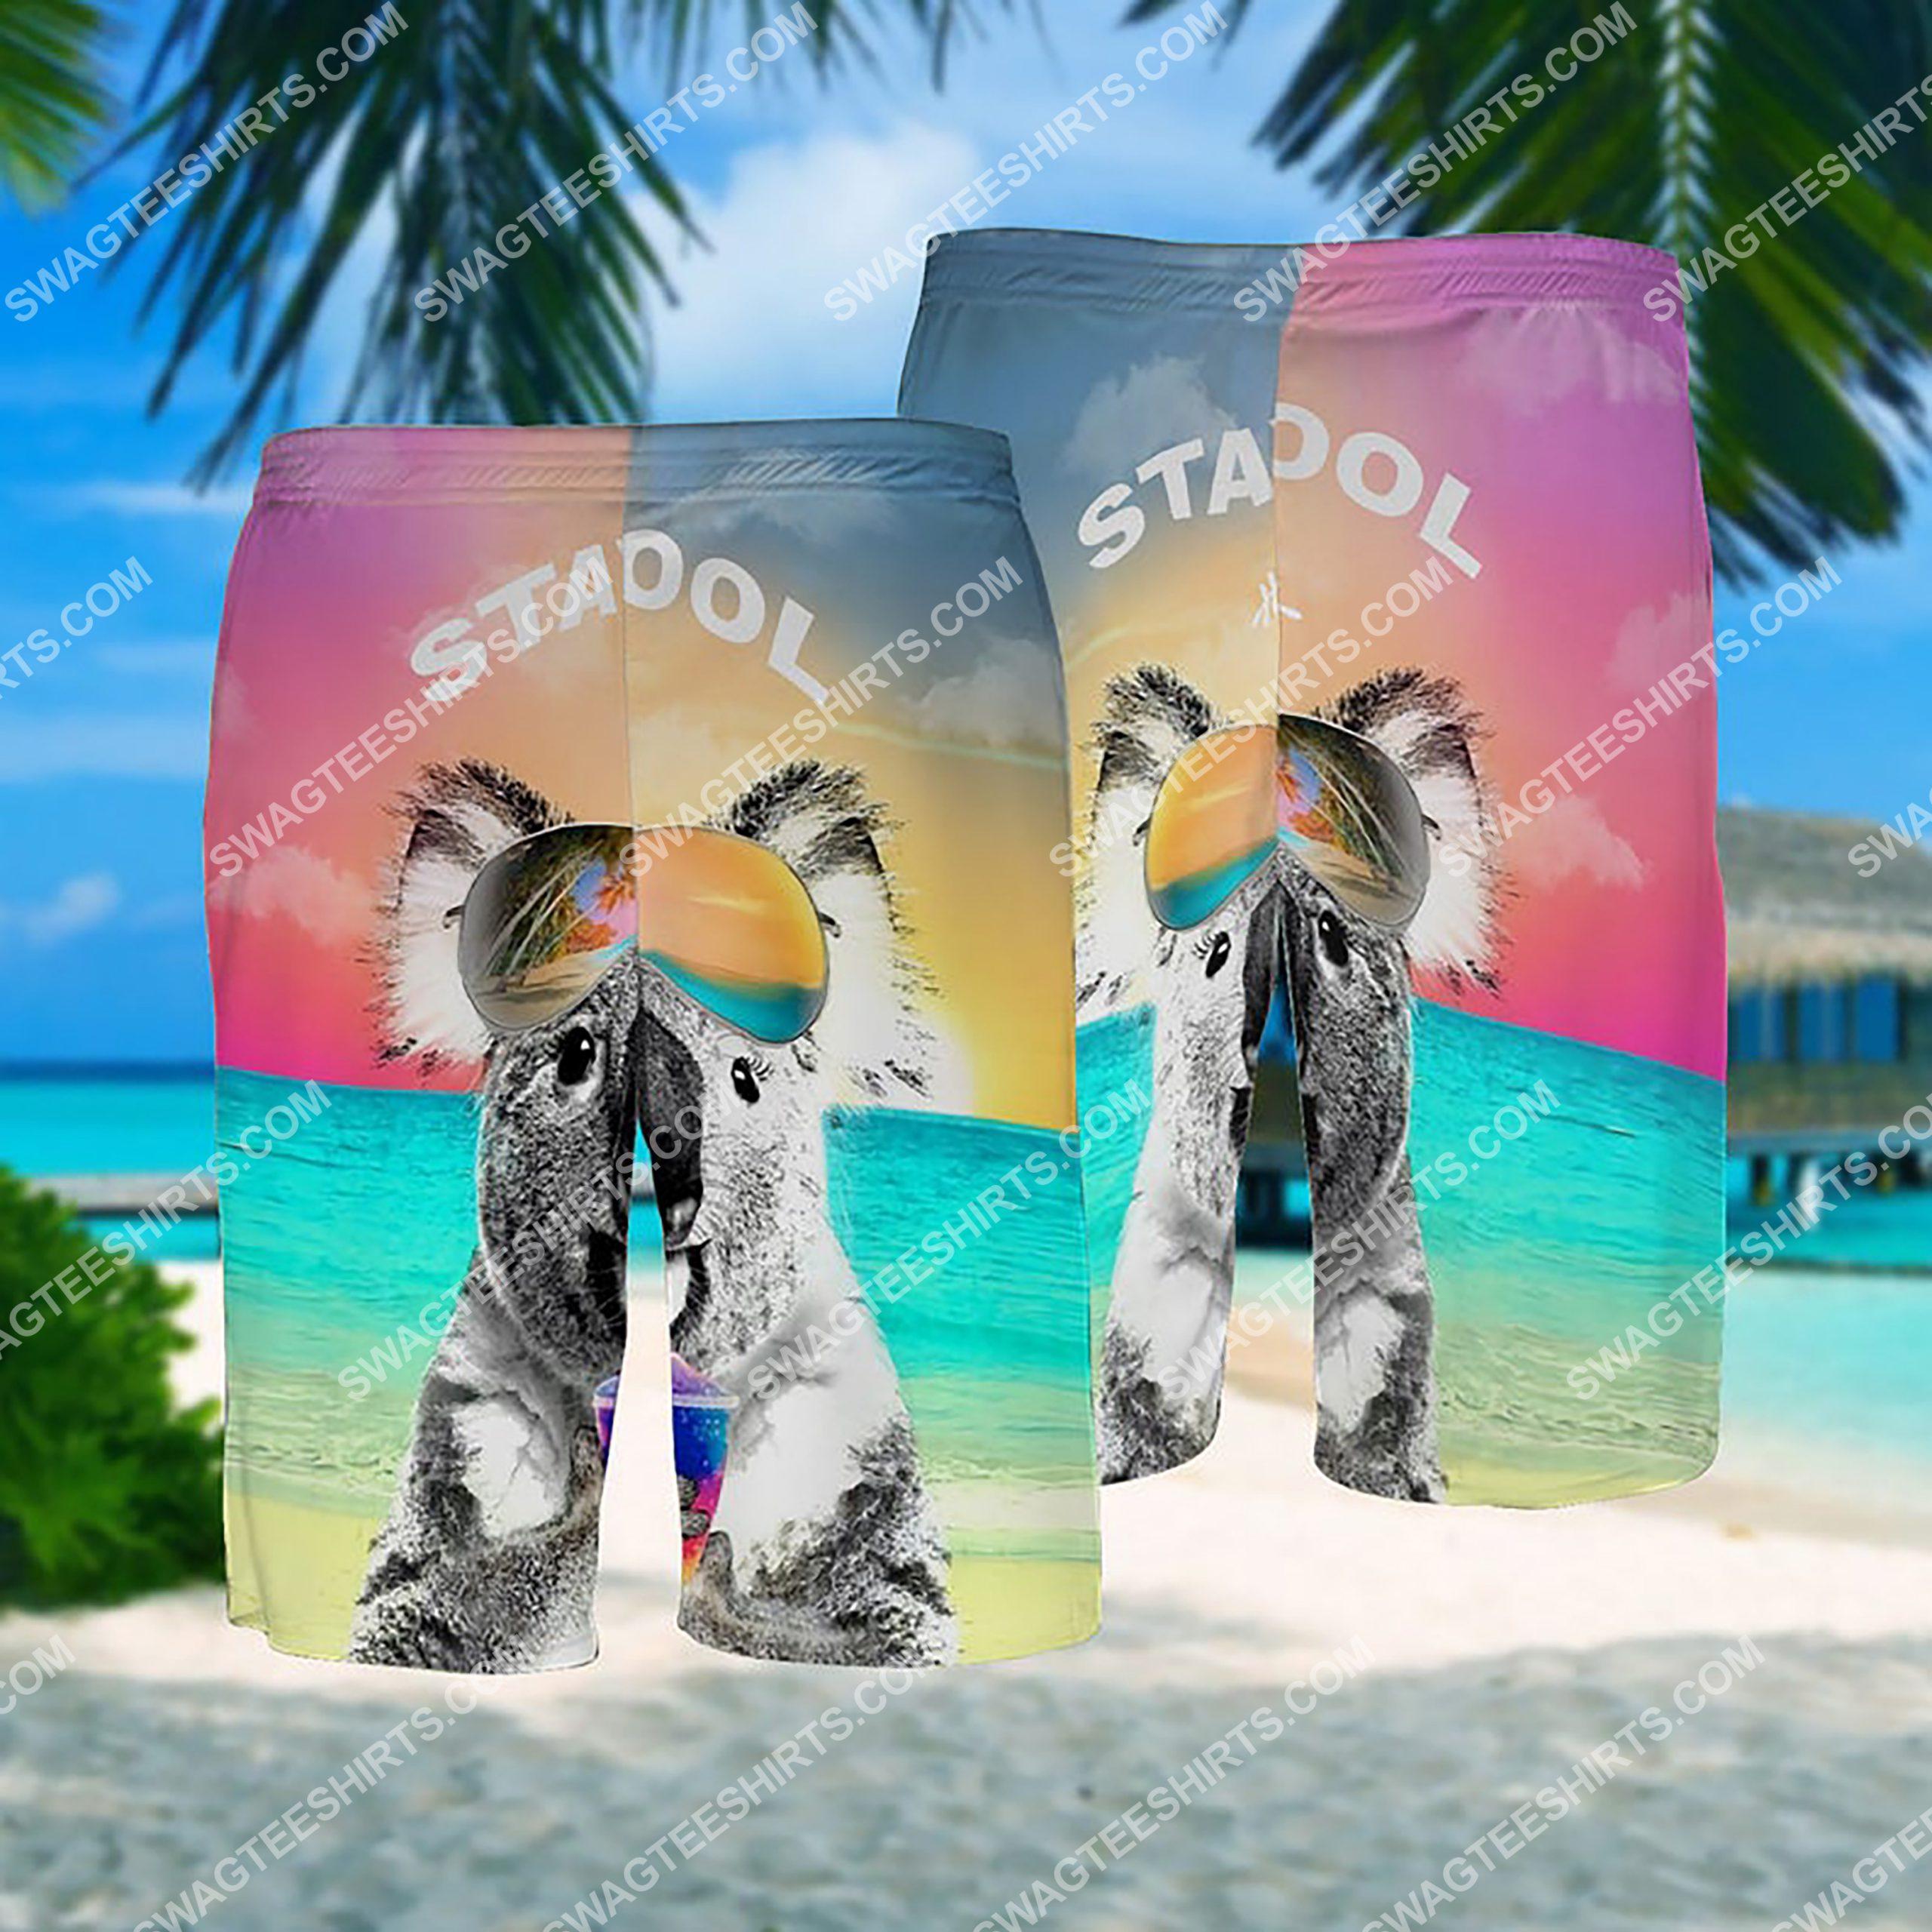 summer time koala stay cool all over print hawaiian shorts 1